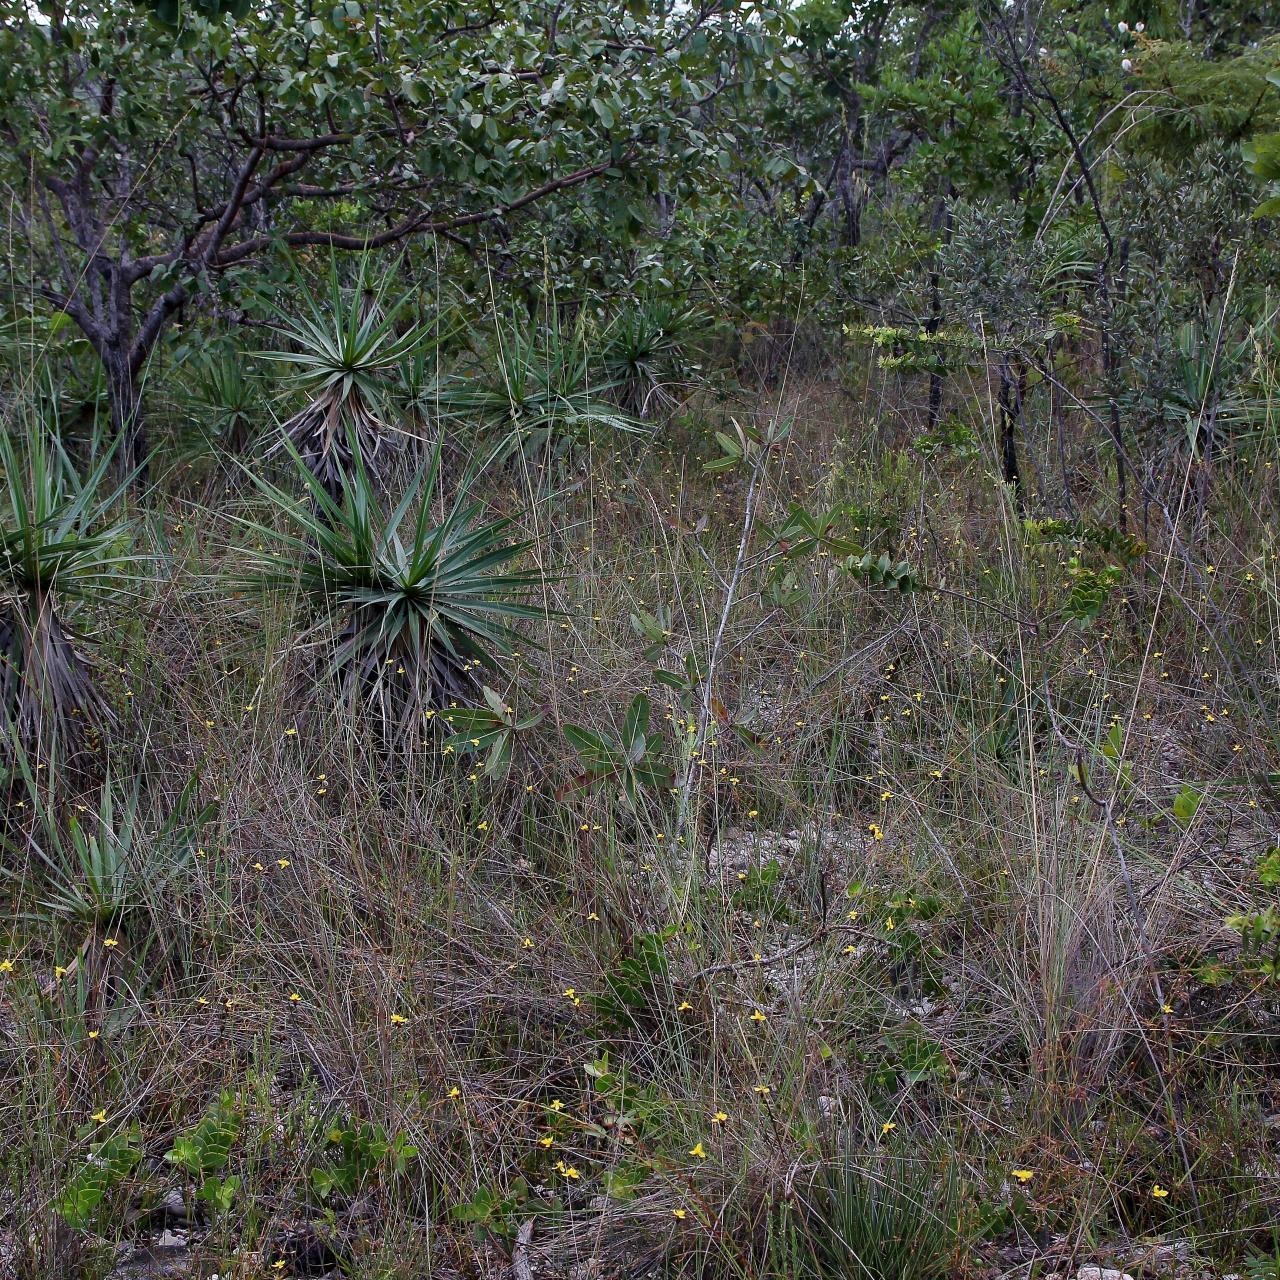 Image of Richard's yelloweyed grass